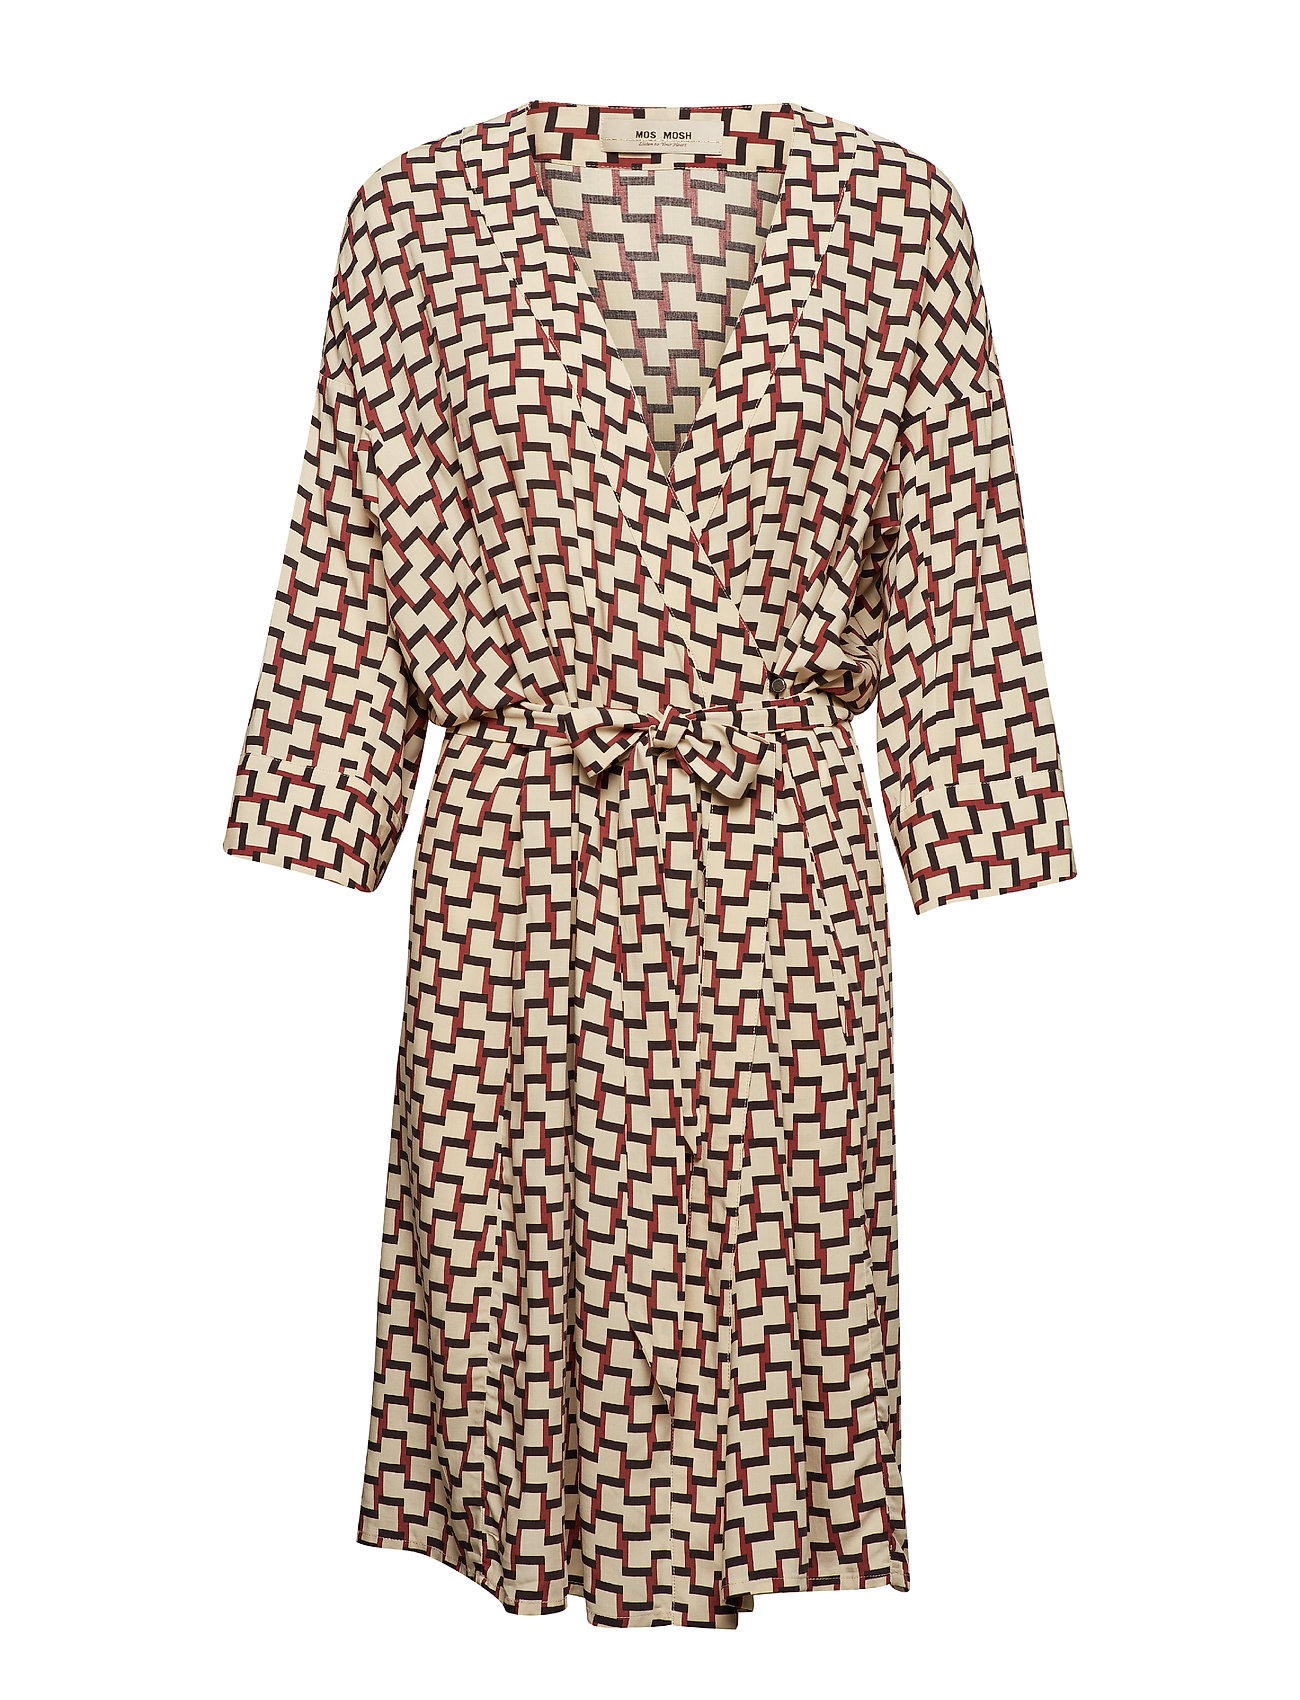 MOS MOSH Erika Graphic Dress